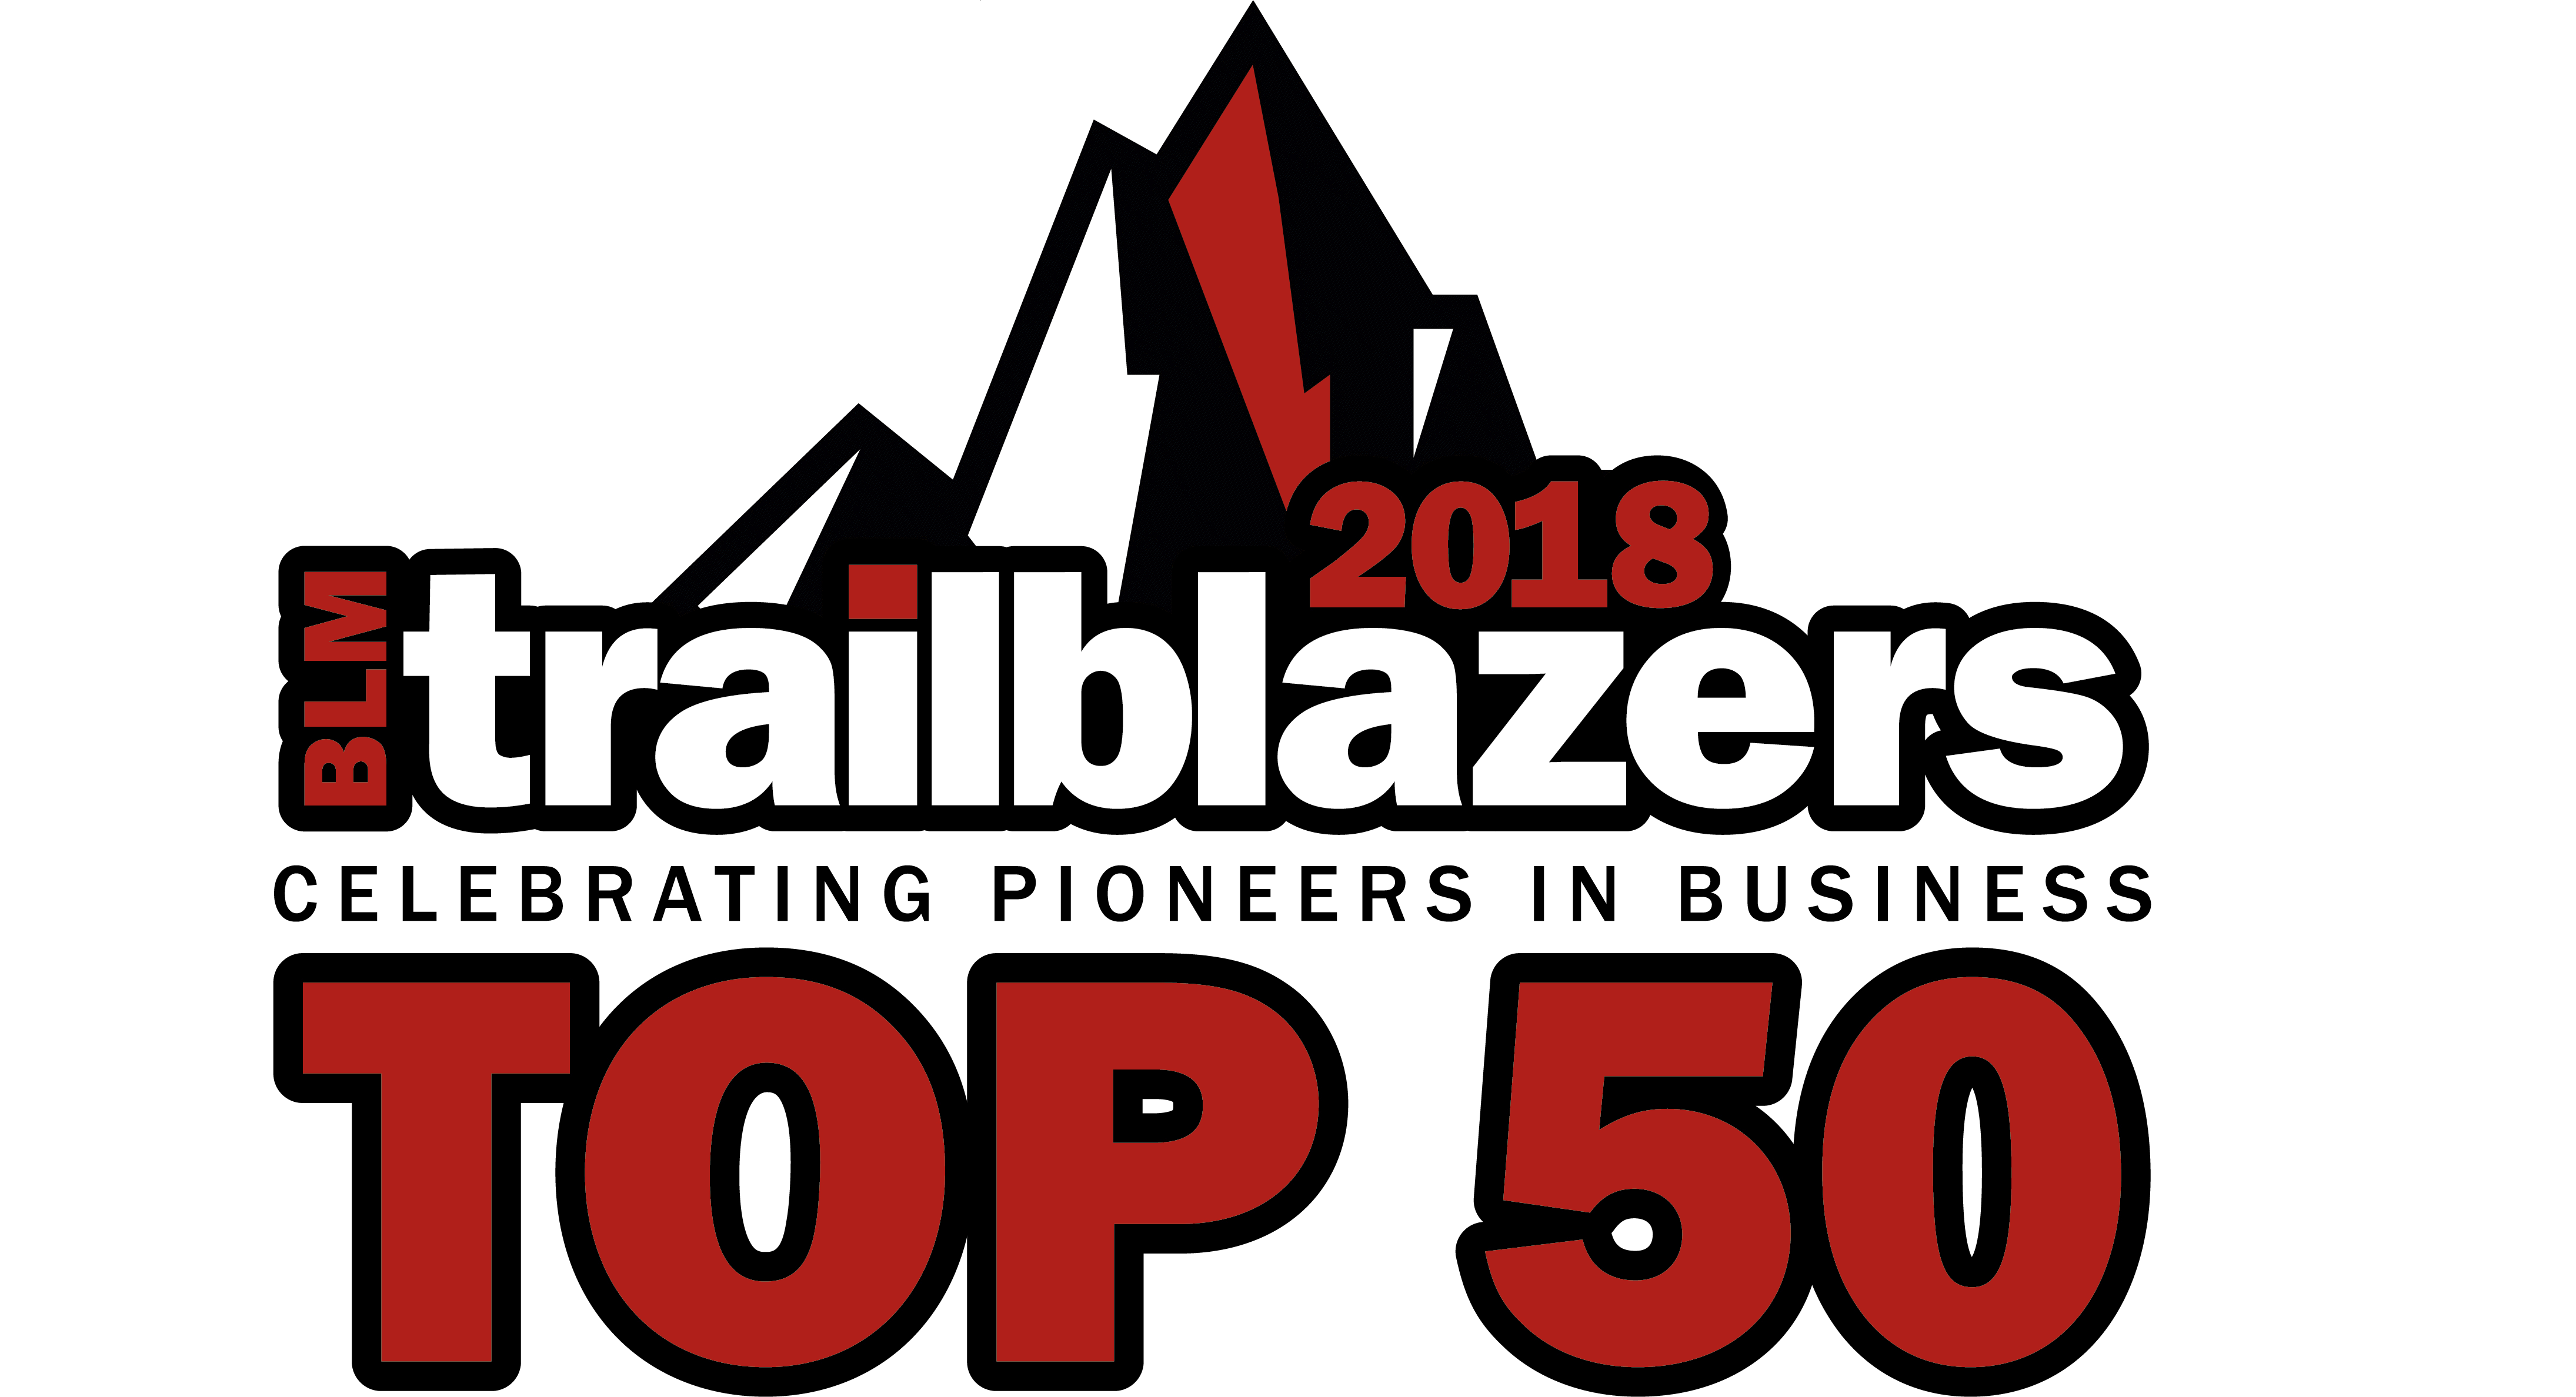 Image for Business Leader top 50 trailblazer (Simon Brown)